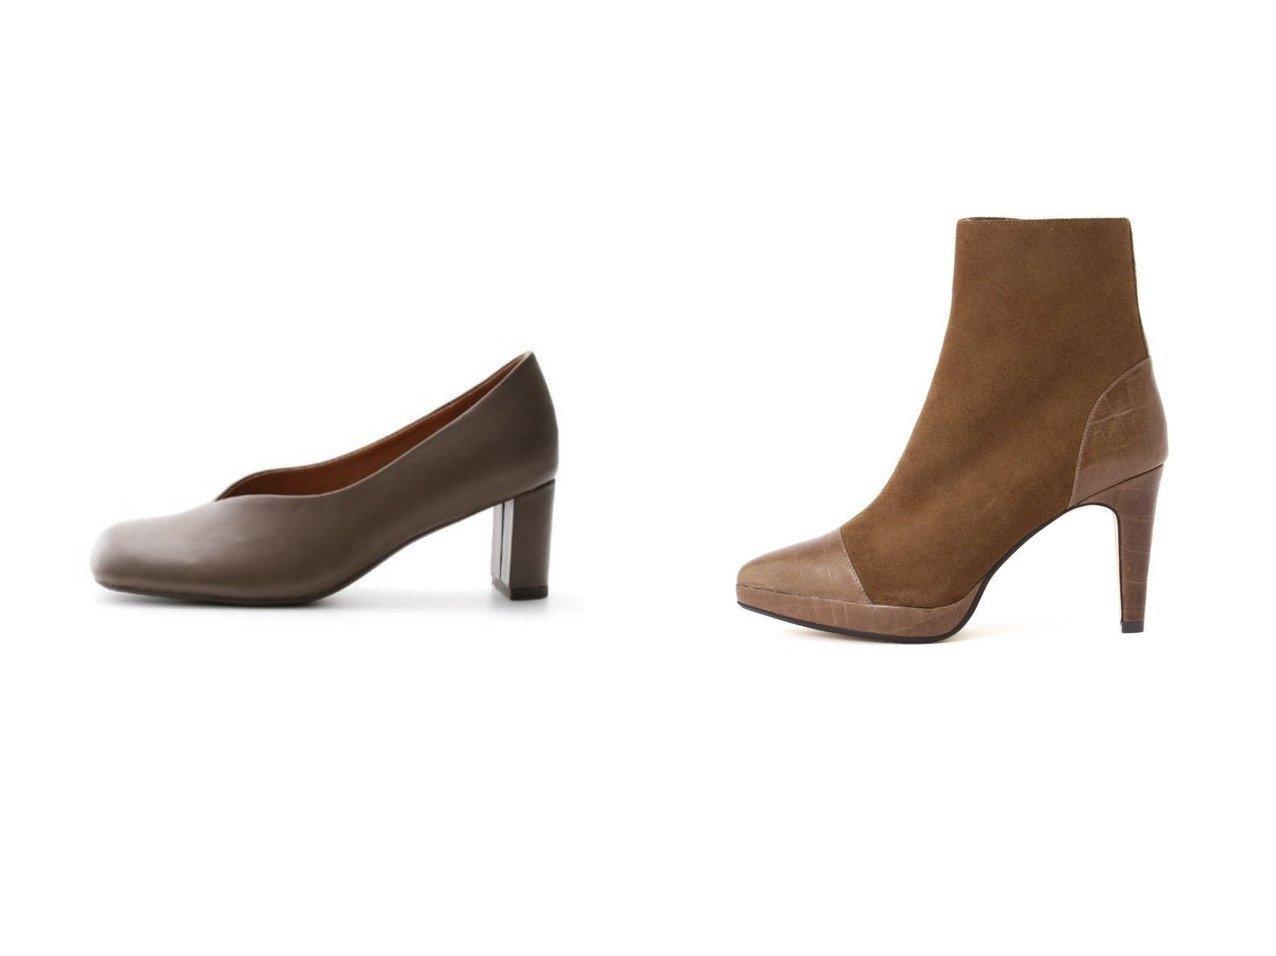 【Mila Owen/ミラオーウェン】のラウンドスクエアパンプス&【Pinky&Dianne/ピンキーアンドダイアン】のクロココンビネーションブーツ シューズ・靴のおすすめ!人気、トレンド・レディースファッションの通販  おすすめで人気の流行・トレンド、ファッションの通販商品 メンズファッション・キッズファッション・インテリア・家具・レディースファッション・服の通販 founy(ファニー) https://founy.com/ ファッション Fashion レディースファッション WOMEN シューズ スタイリッシュ フェミニン フォルム マニッシュ クロコ ショート フィット  ID:crp329100000009851